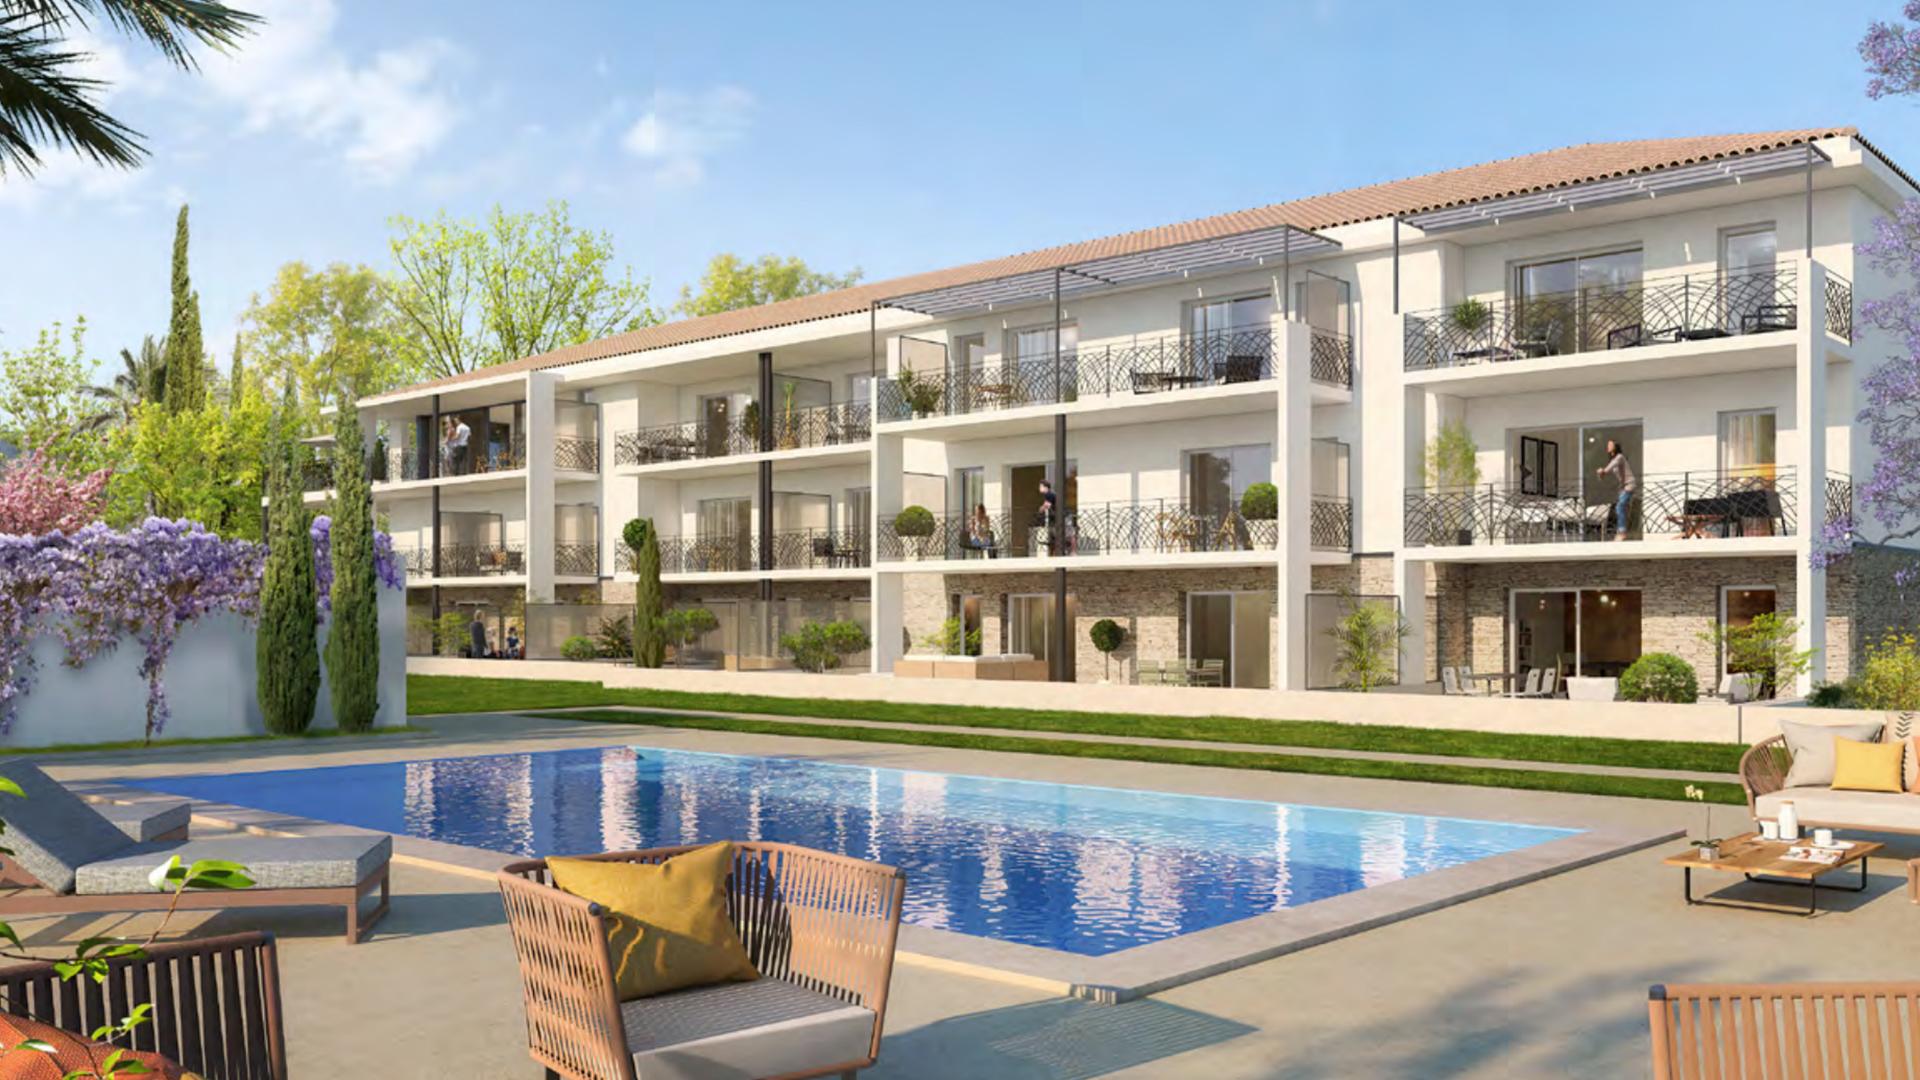 New apartments in La Garde 83130